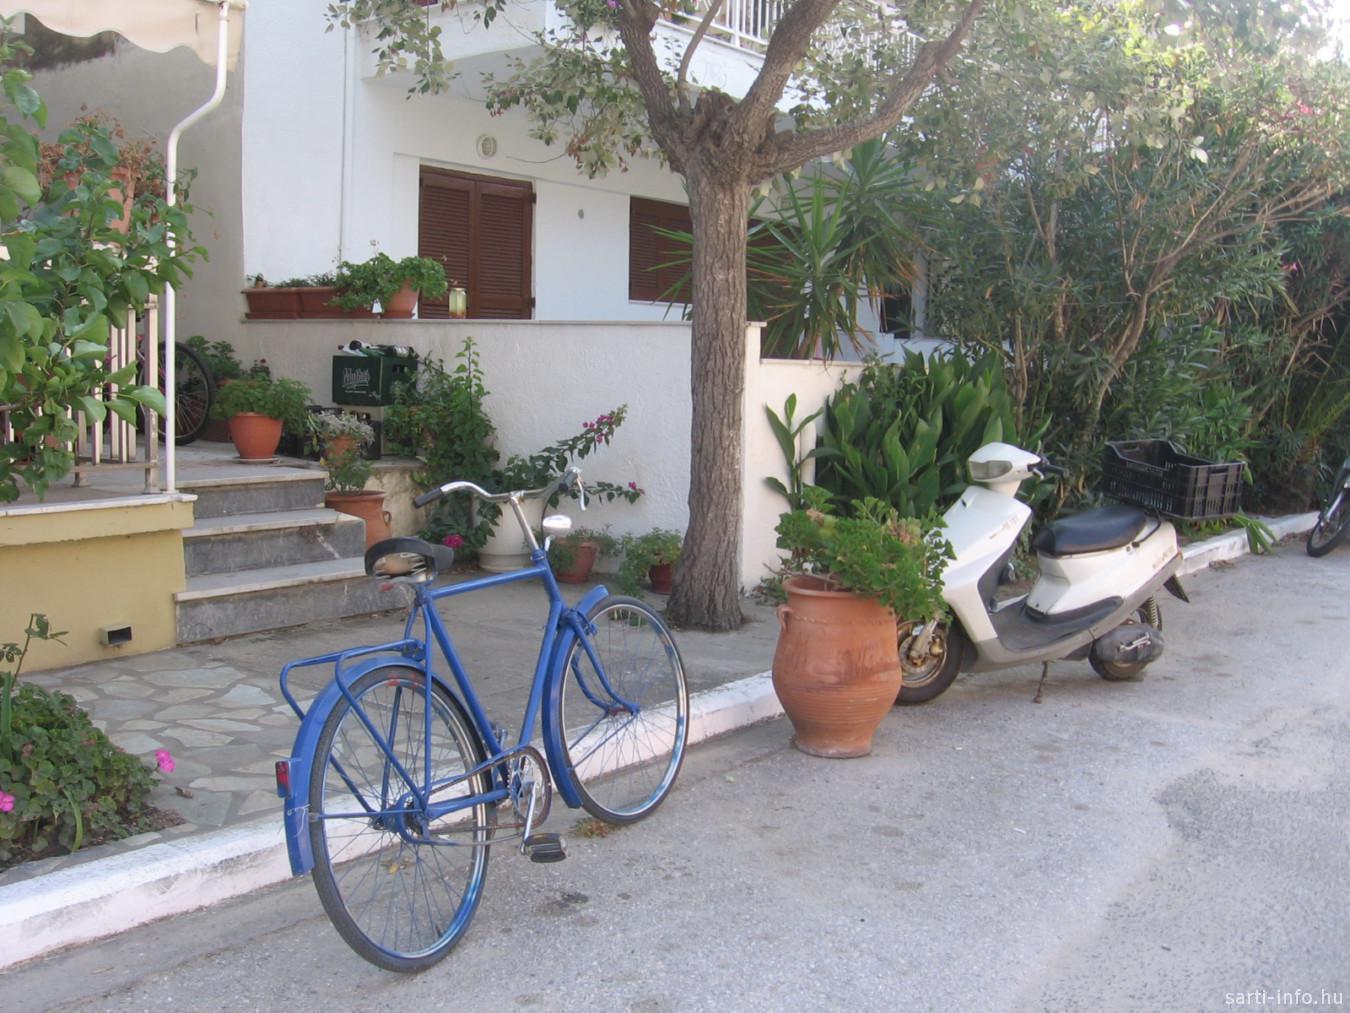 Kék bicikli